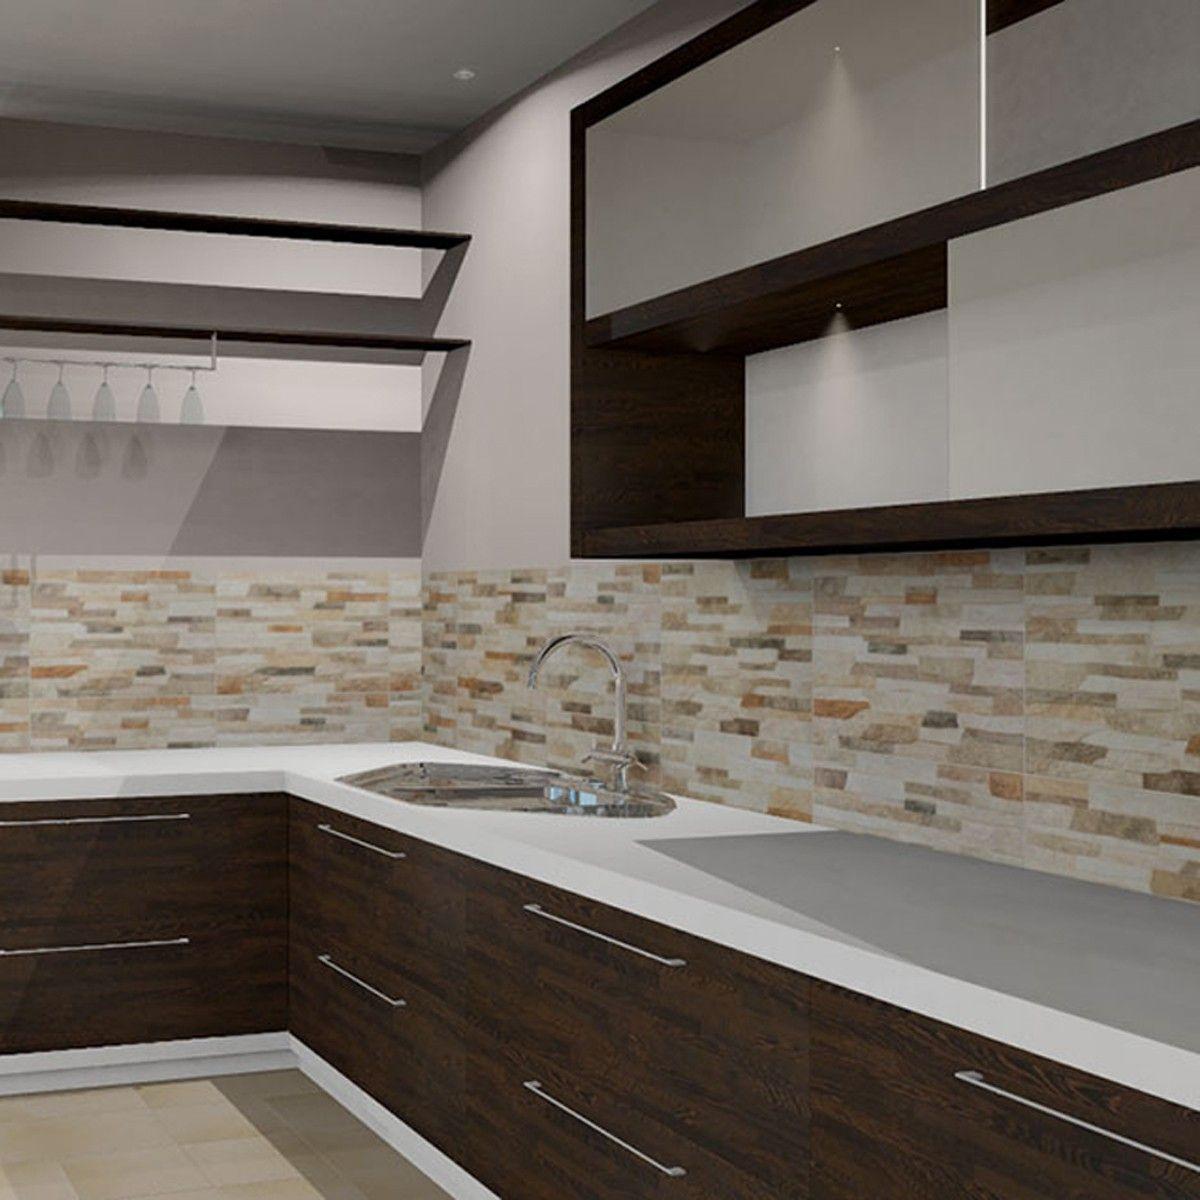 45x15 Valbona Beige - Wall Tiles - Tile Choice | Kitchen Wall Tiles ...